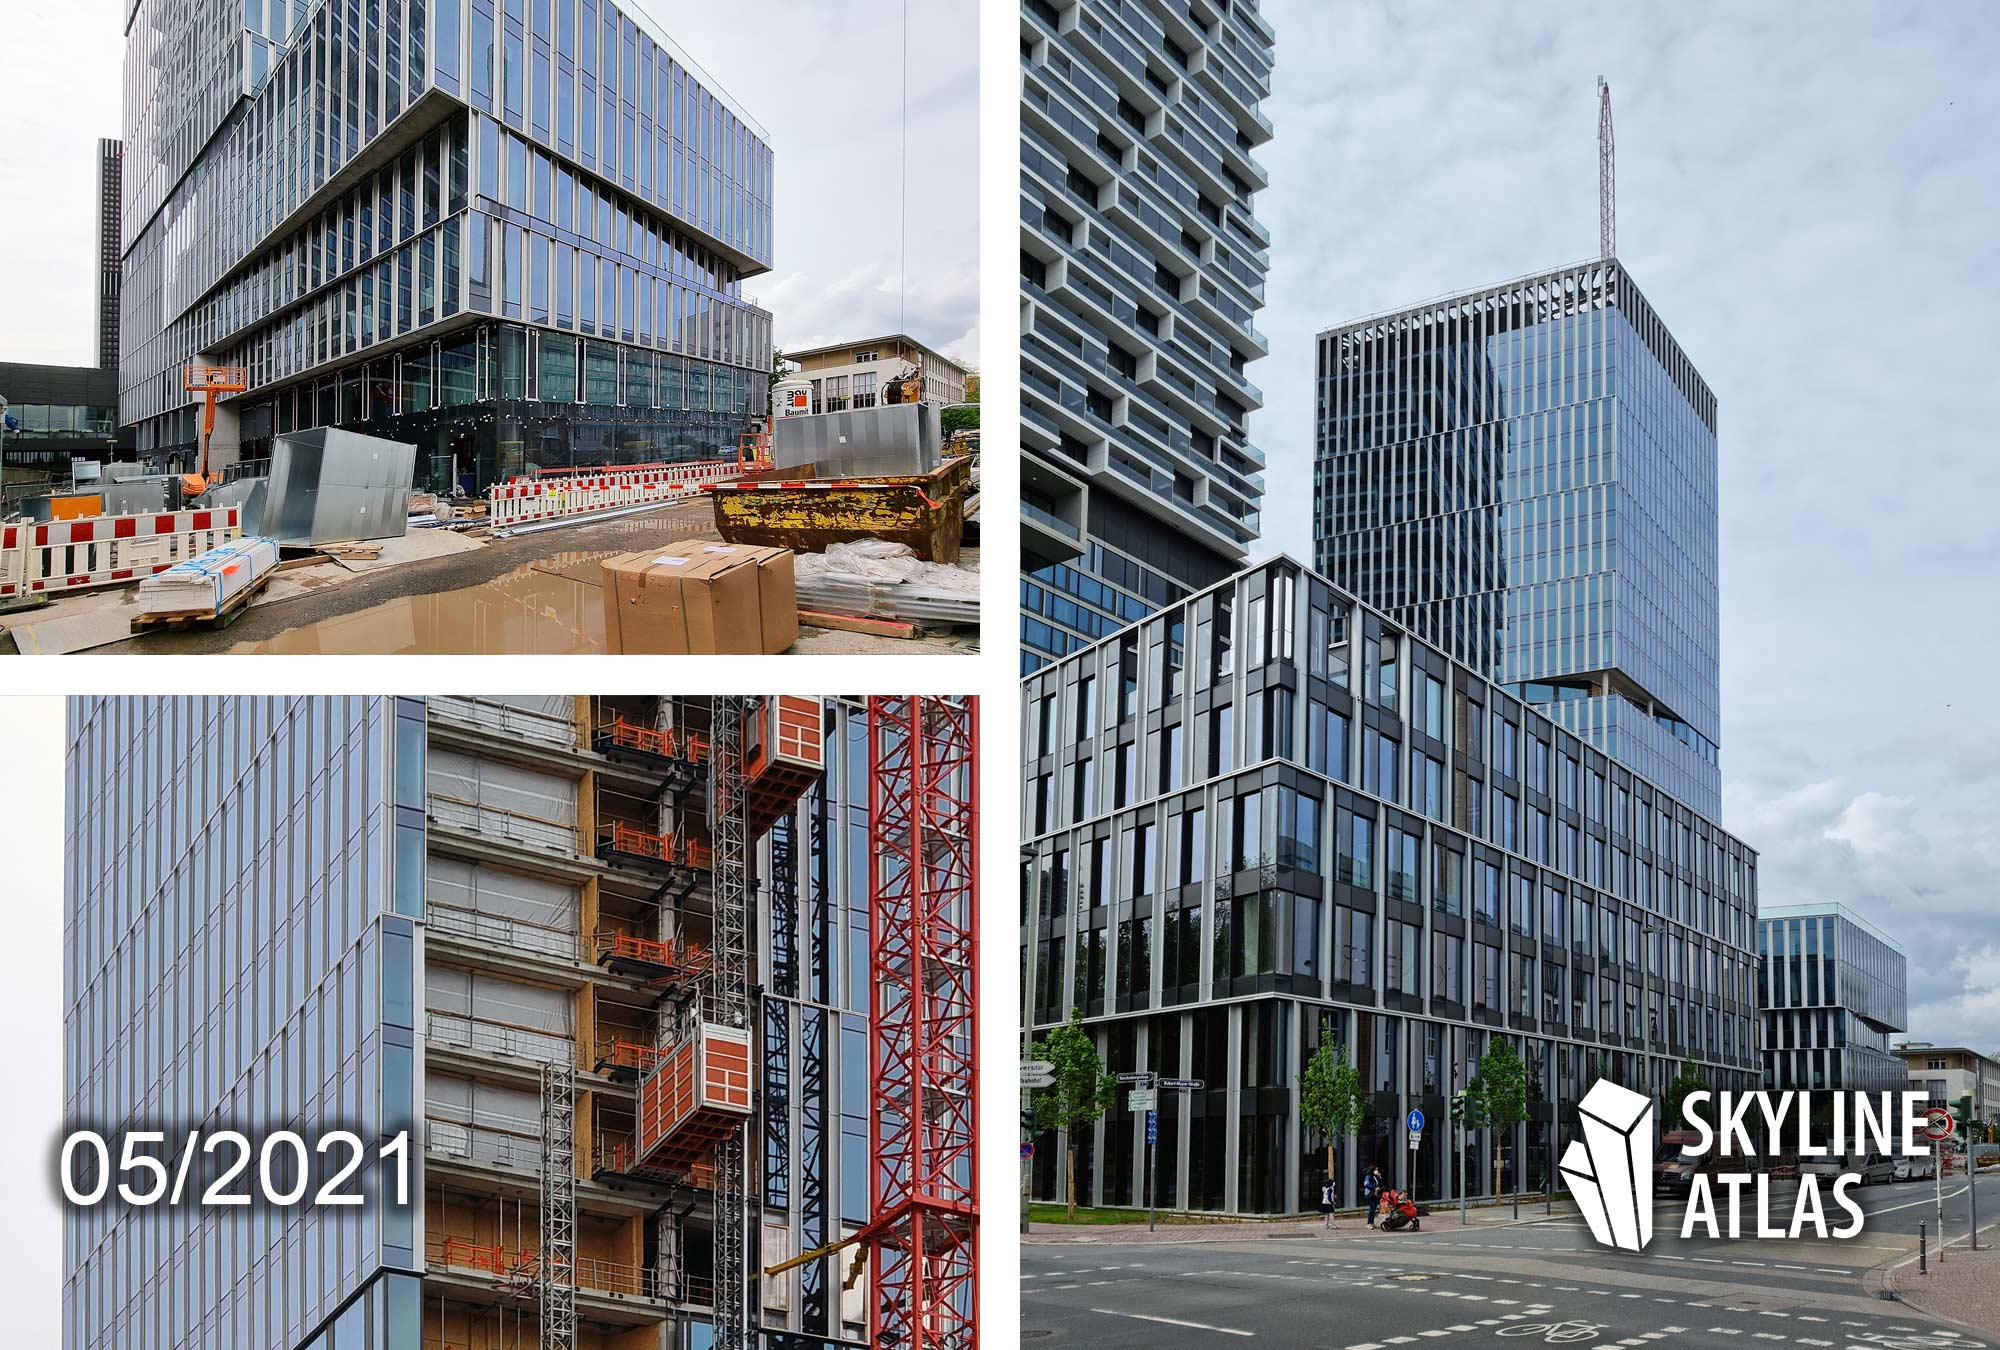 Senckenbergturm FFM - Senckberg Turm Frankfurt am Main - NAS Invest - Baustelle Hochhaus Mai 2021